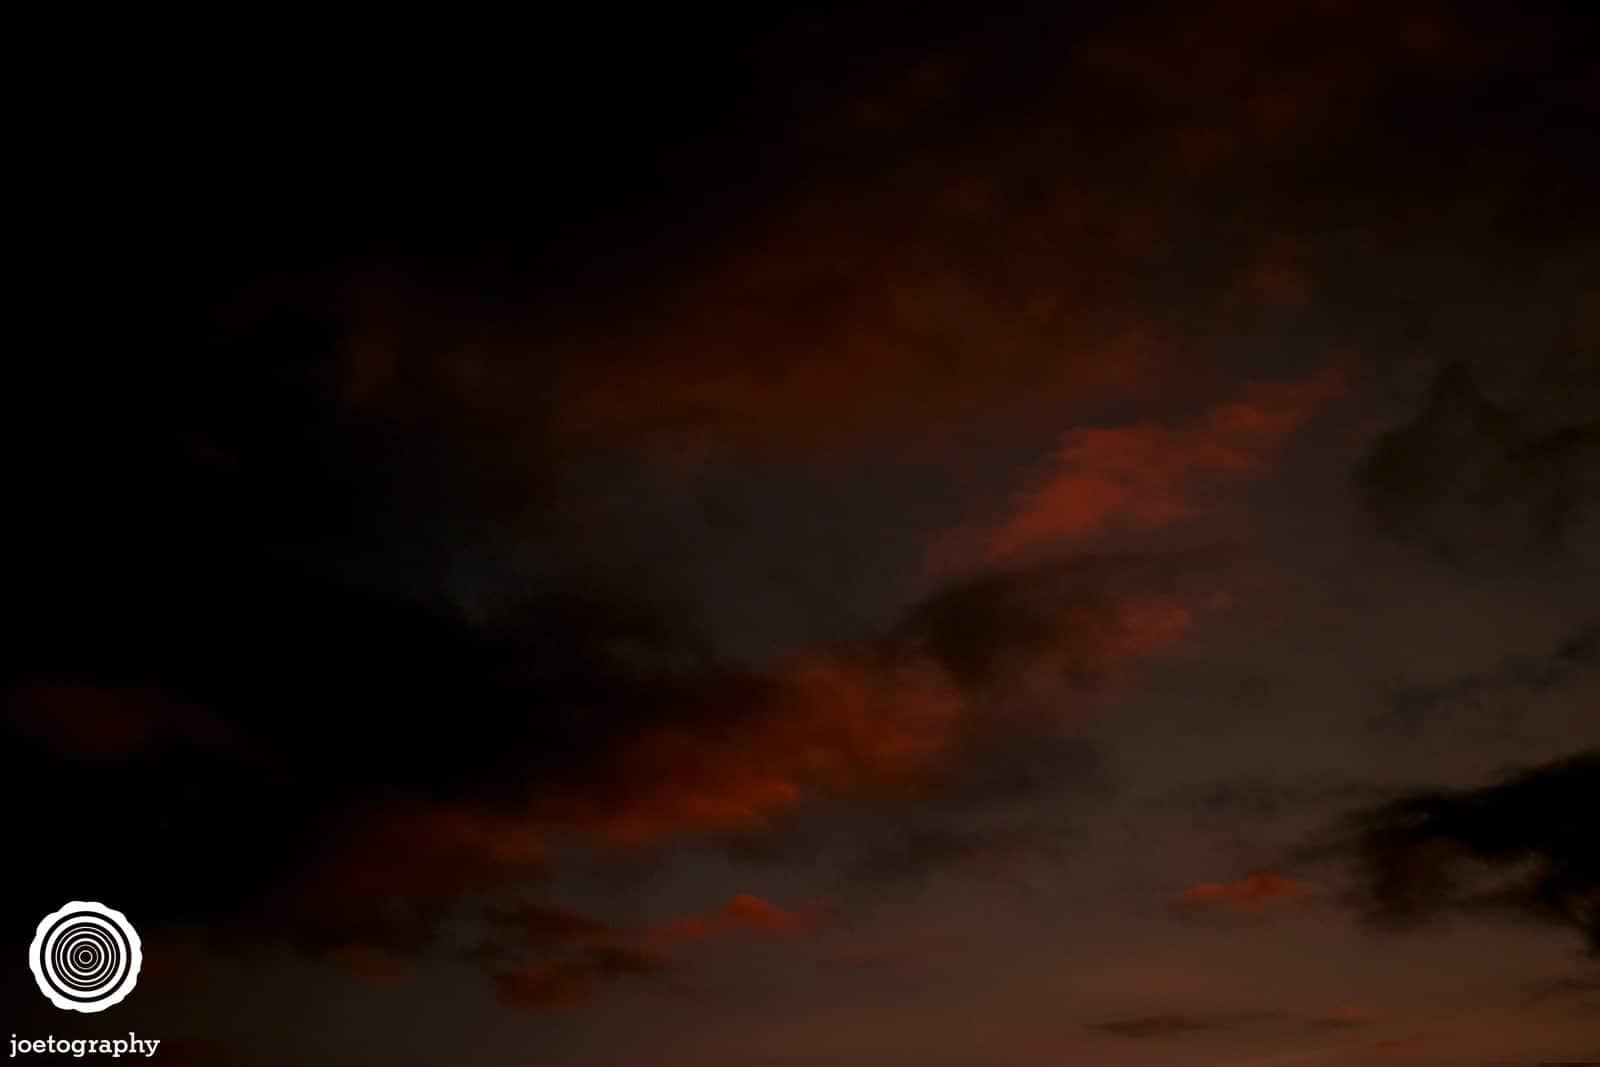 joetography-travel-photography-yosemite-2015-9